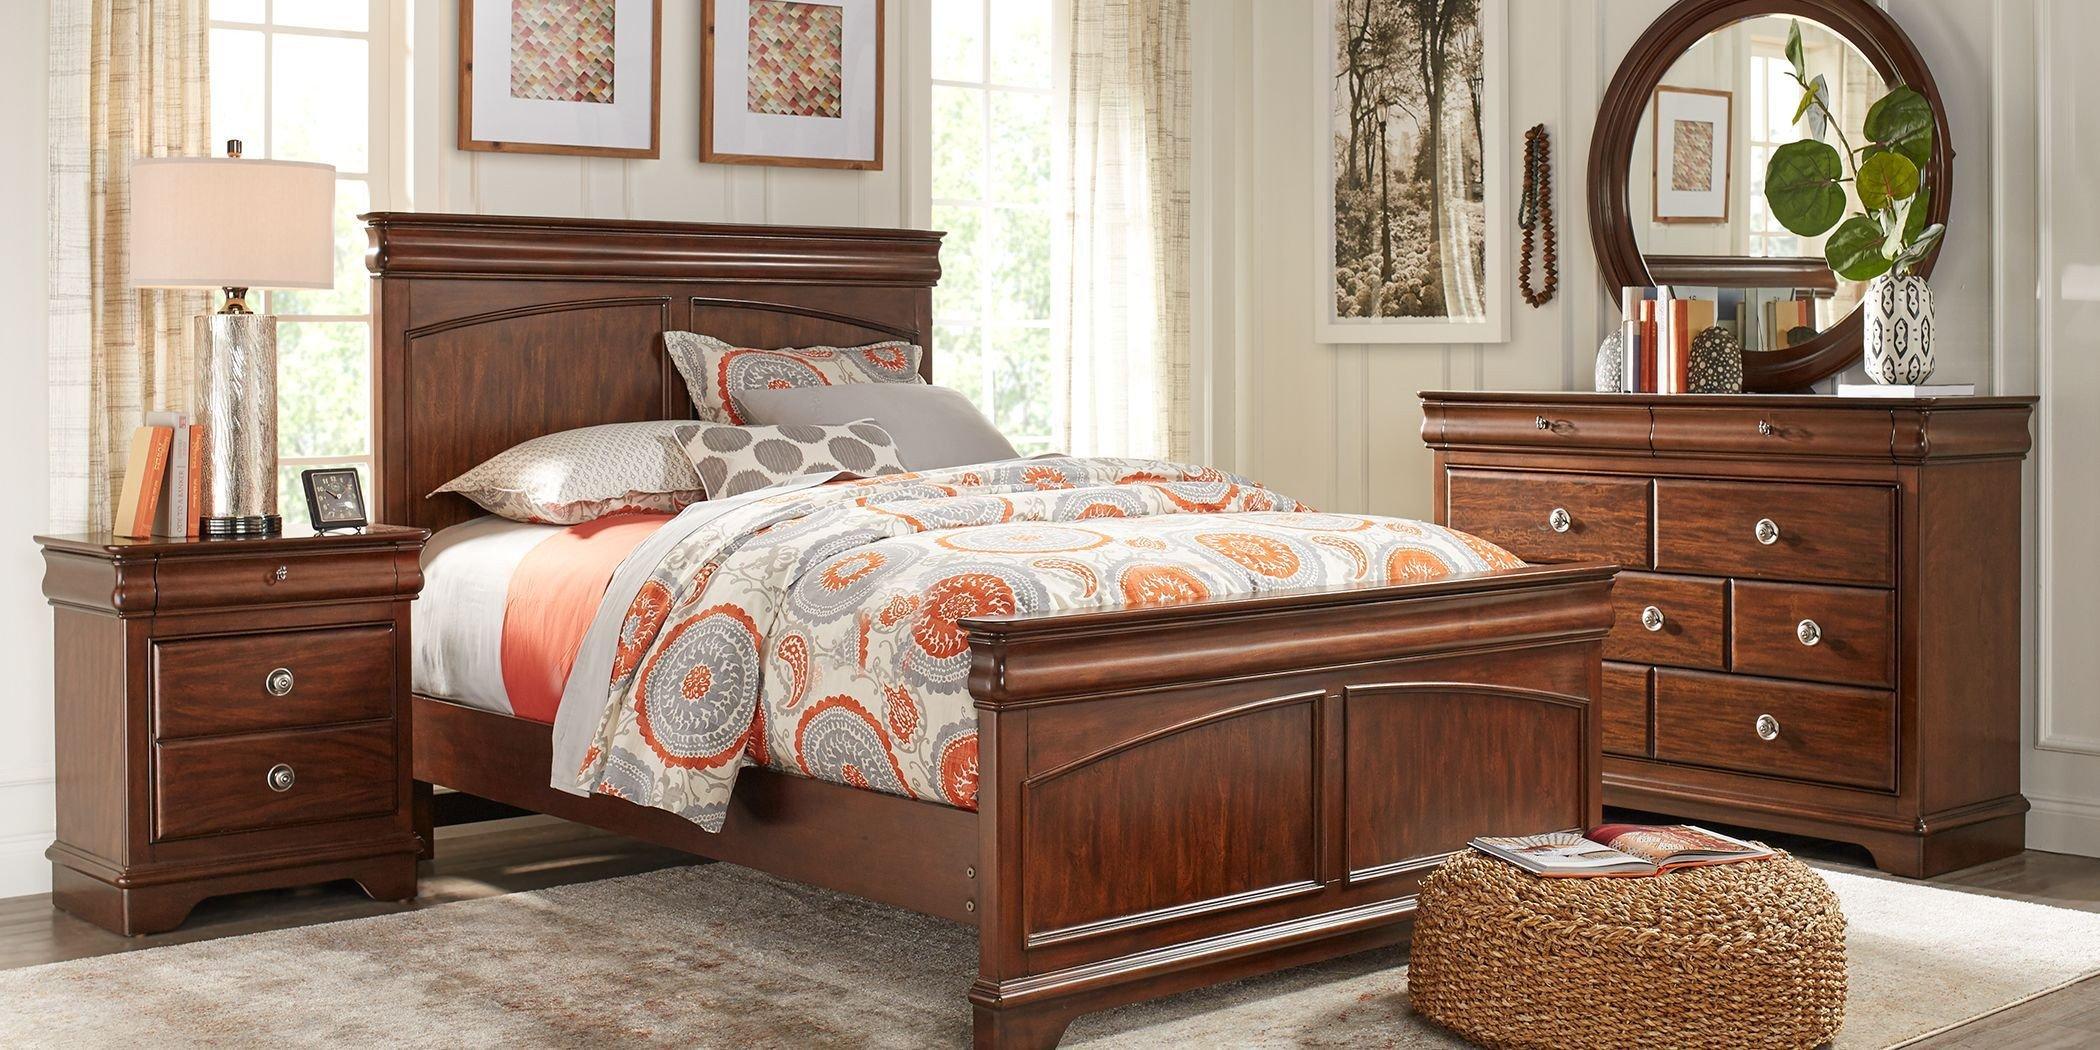 Cheap Twin Bedroom Set Luxury Kids Oberon Cherry 5 Pc Twin Panel Bedroom In 2019